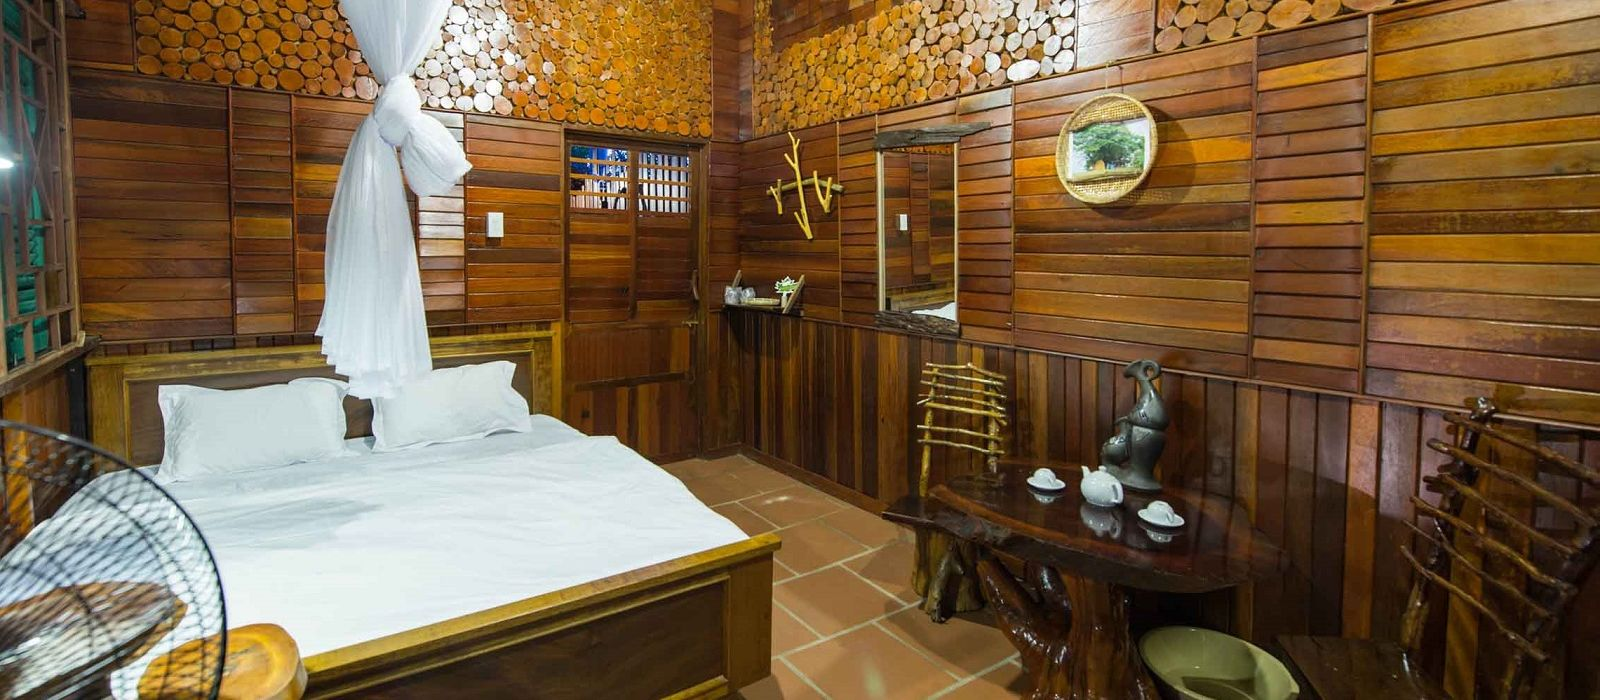 Hotel Mekong Rustic Can Tho Vietnam